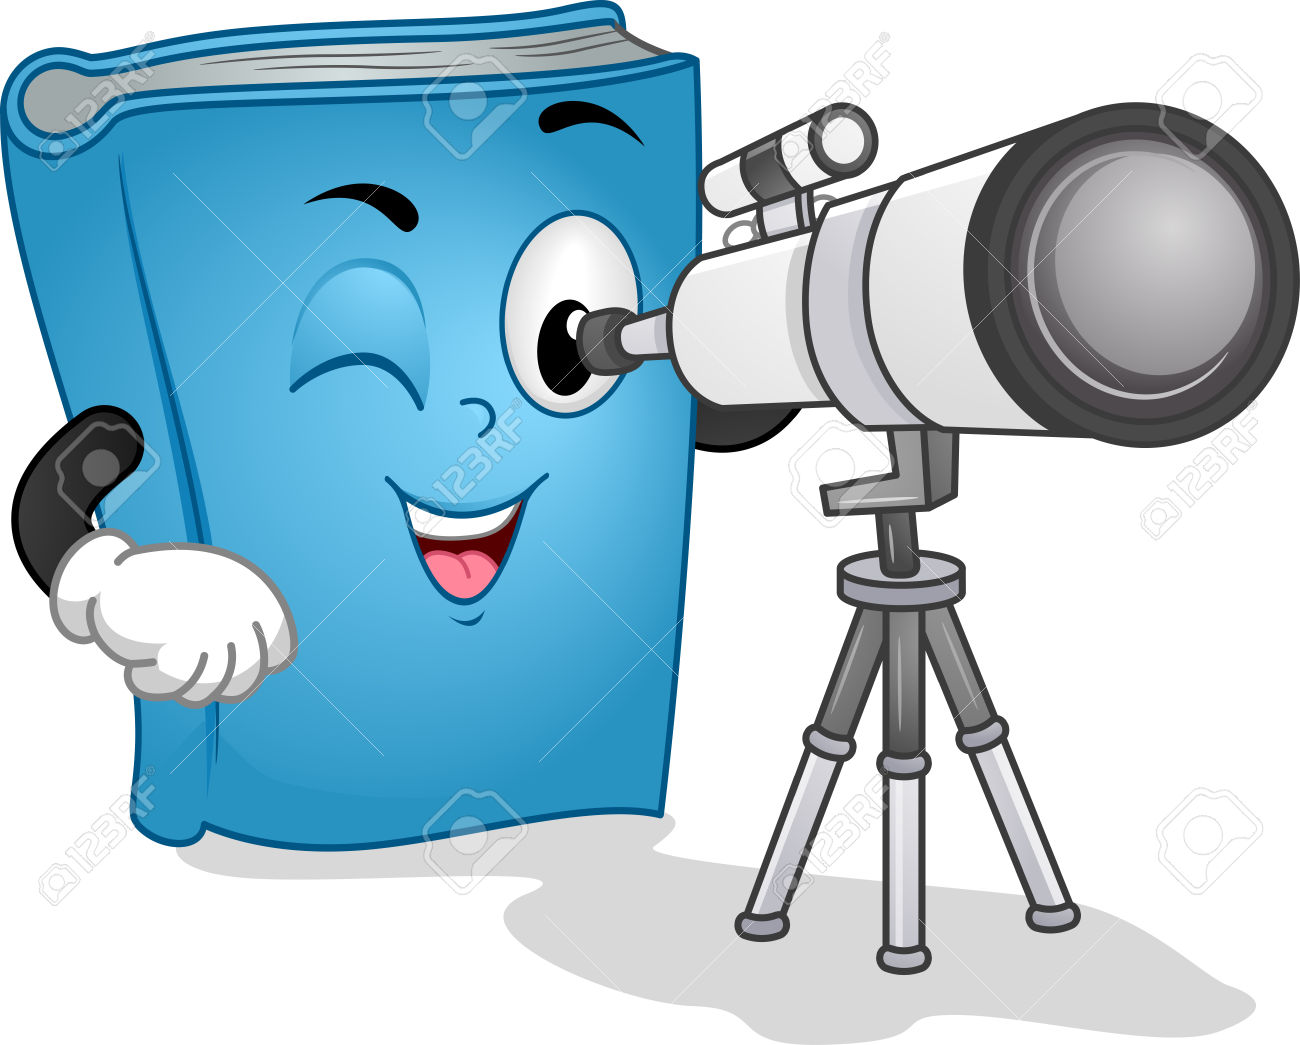 Mascot Illustration Of A Blue Book Using A Long Range Observation.